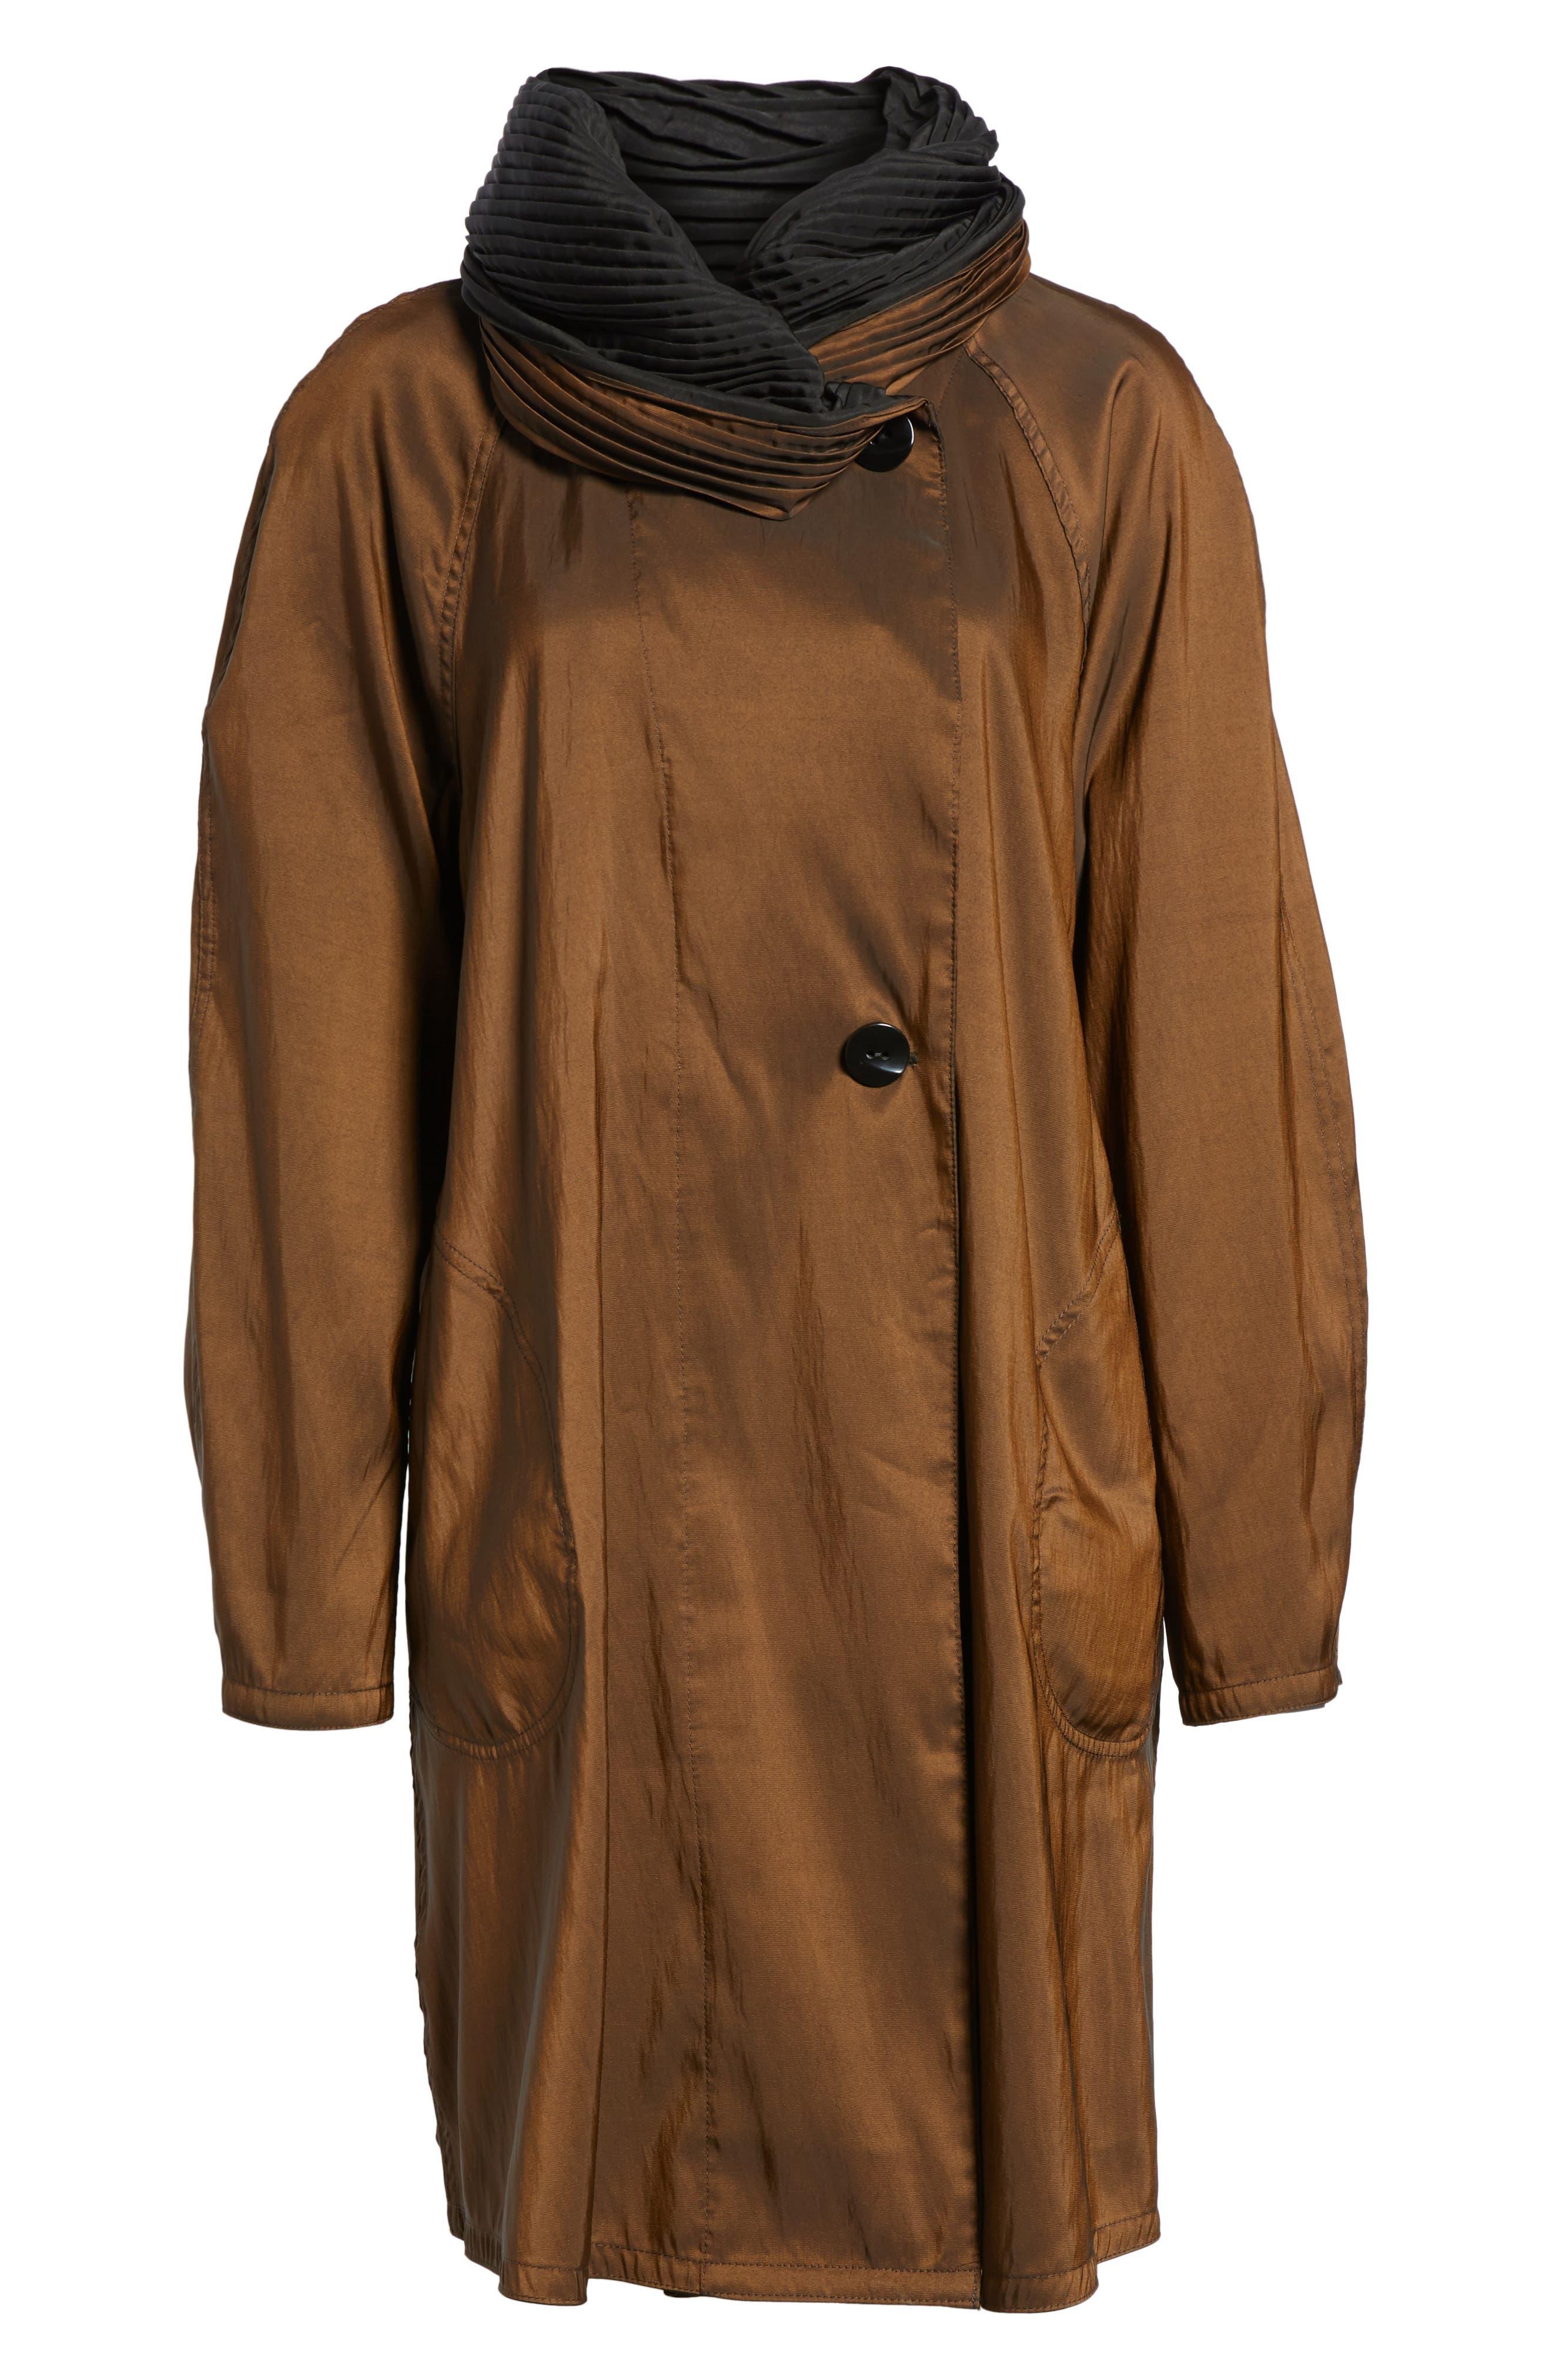 Reversible Pleat Hood Packable Travel Coat,                         Main,                         color, Bronze/ Black